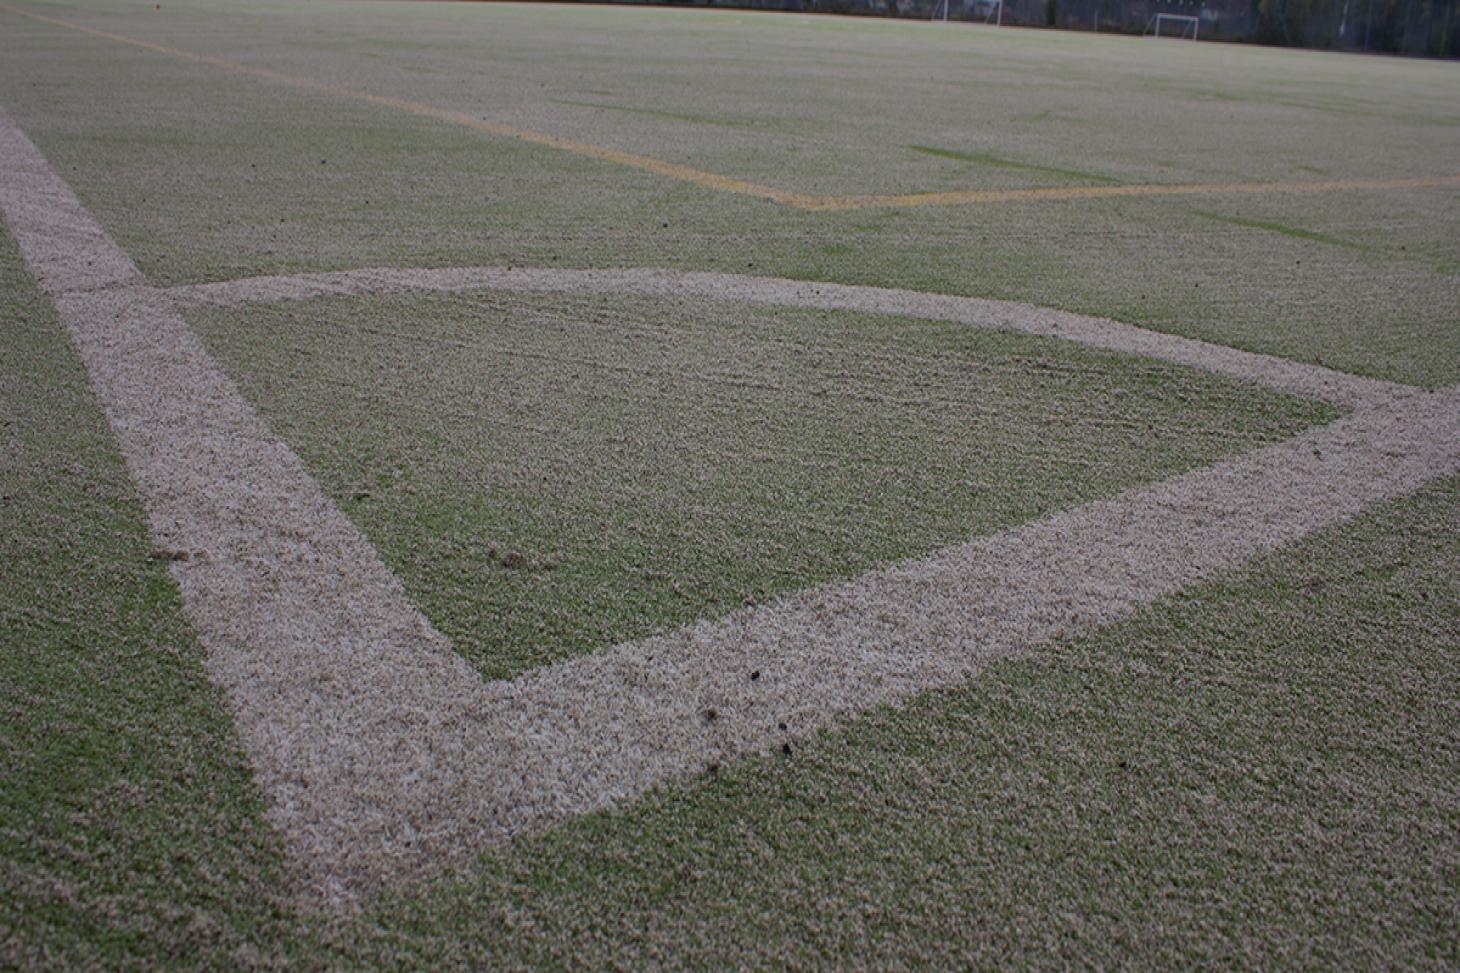 Ark John Keats Academy 7 a side | Astroturf football pitch